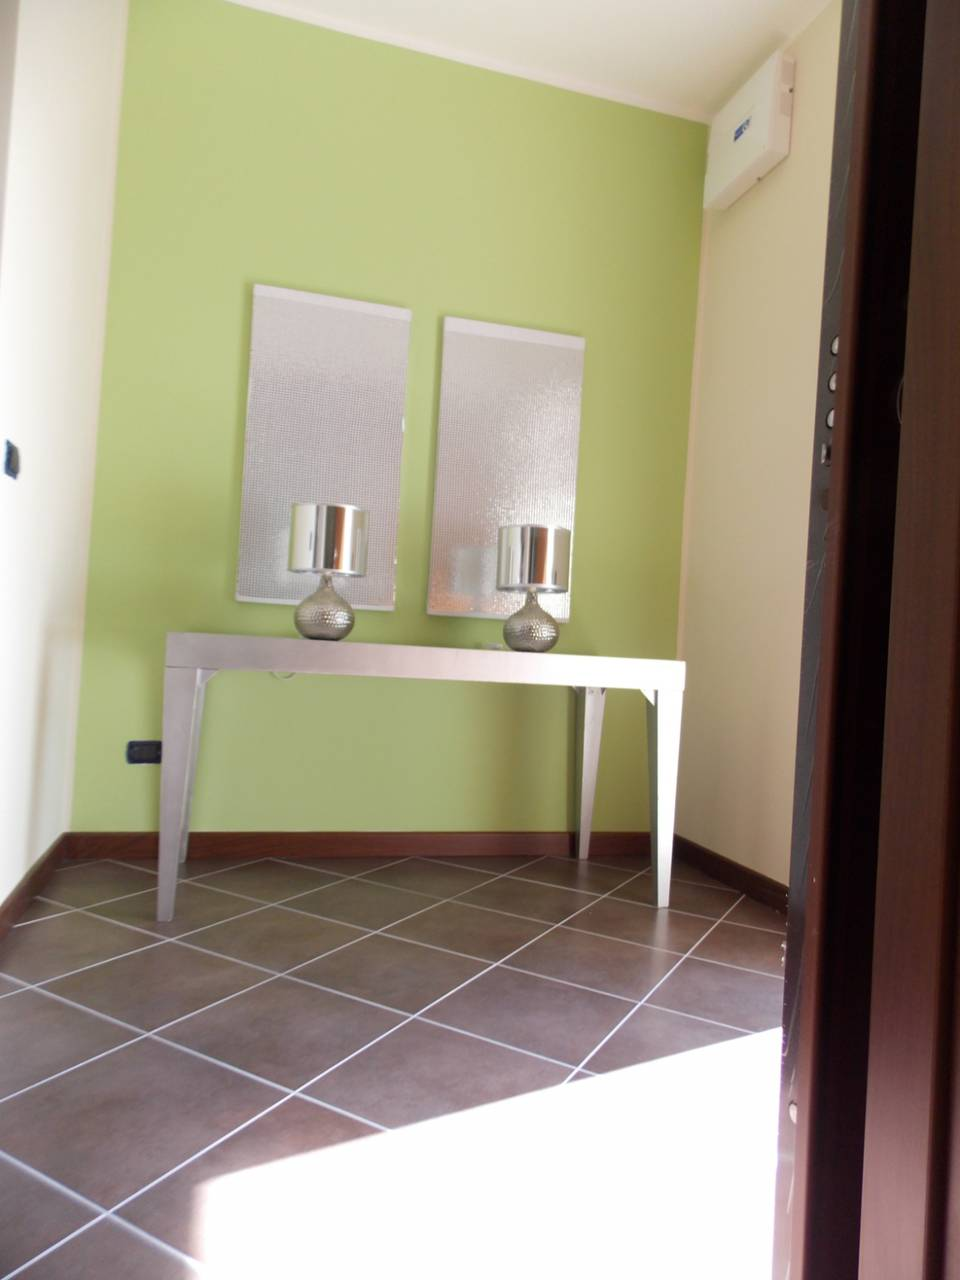 Monolocale-in-vendita-a-San-Giuliano-Milanese-5